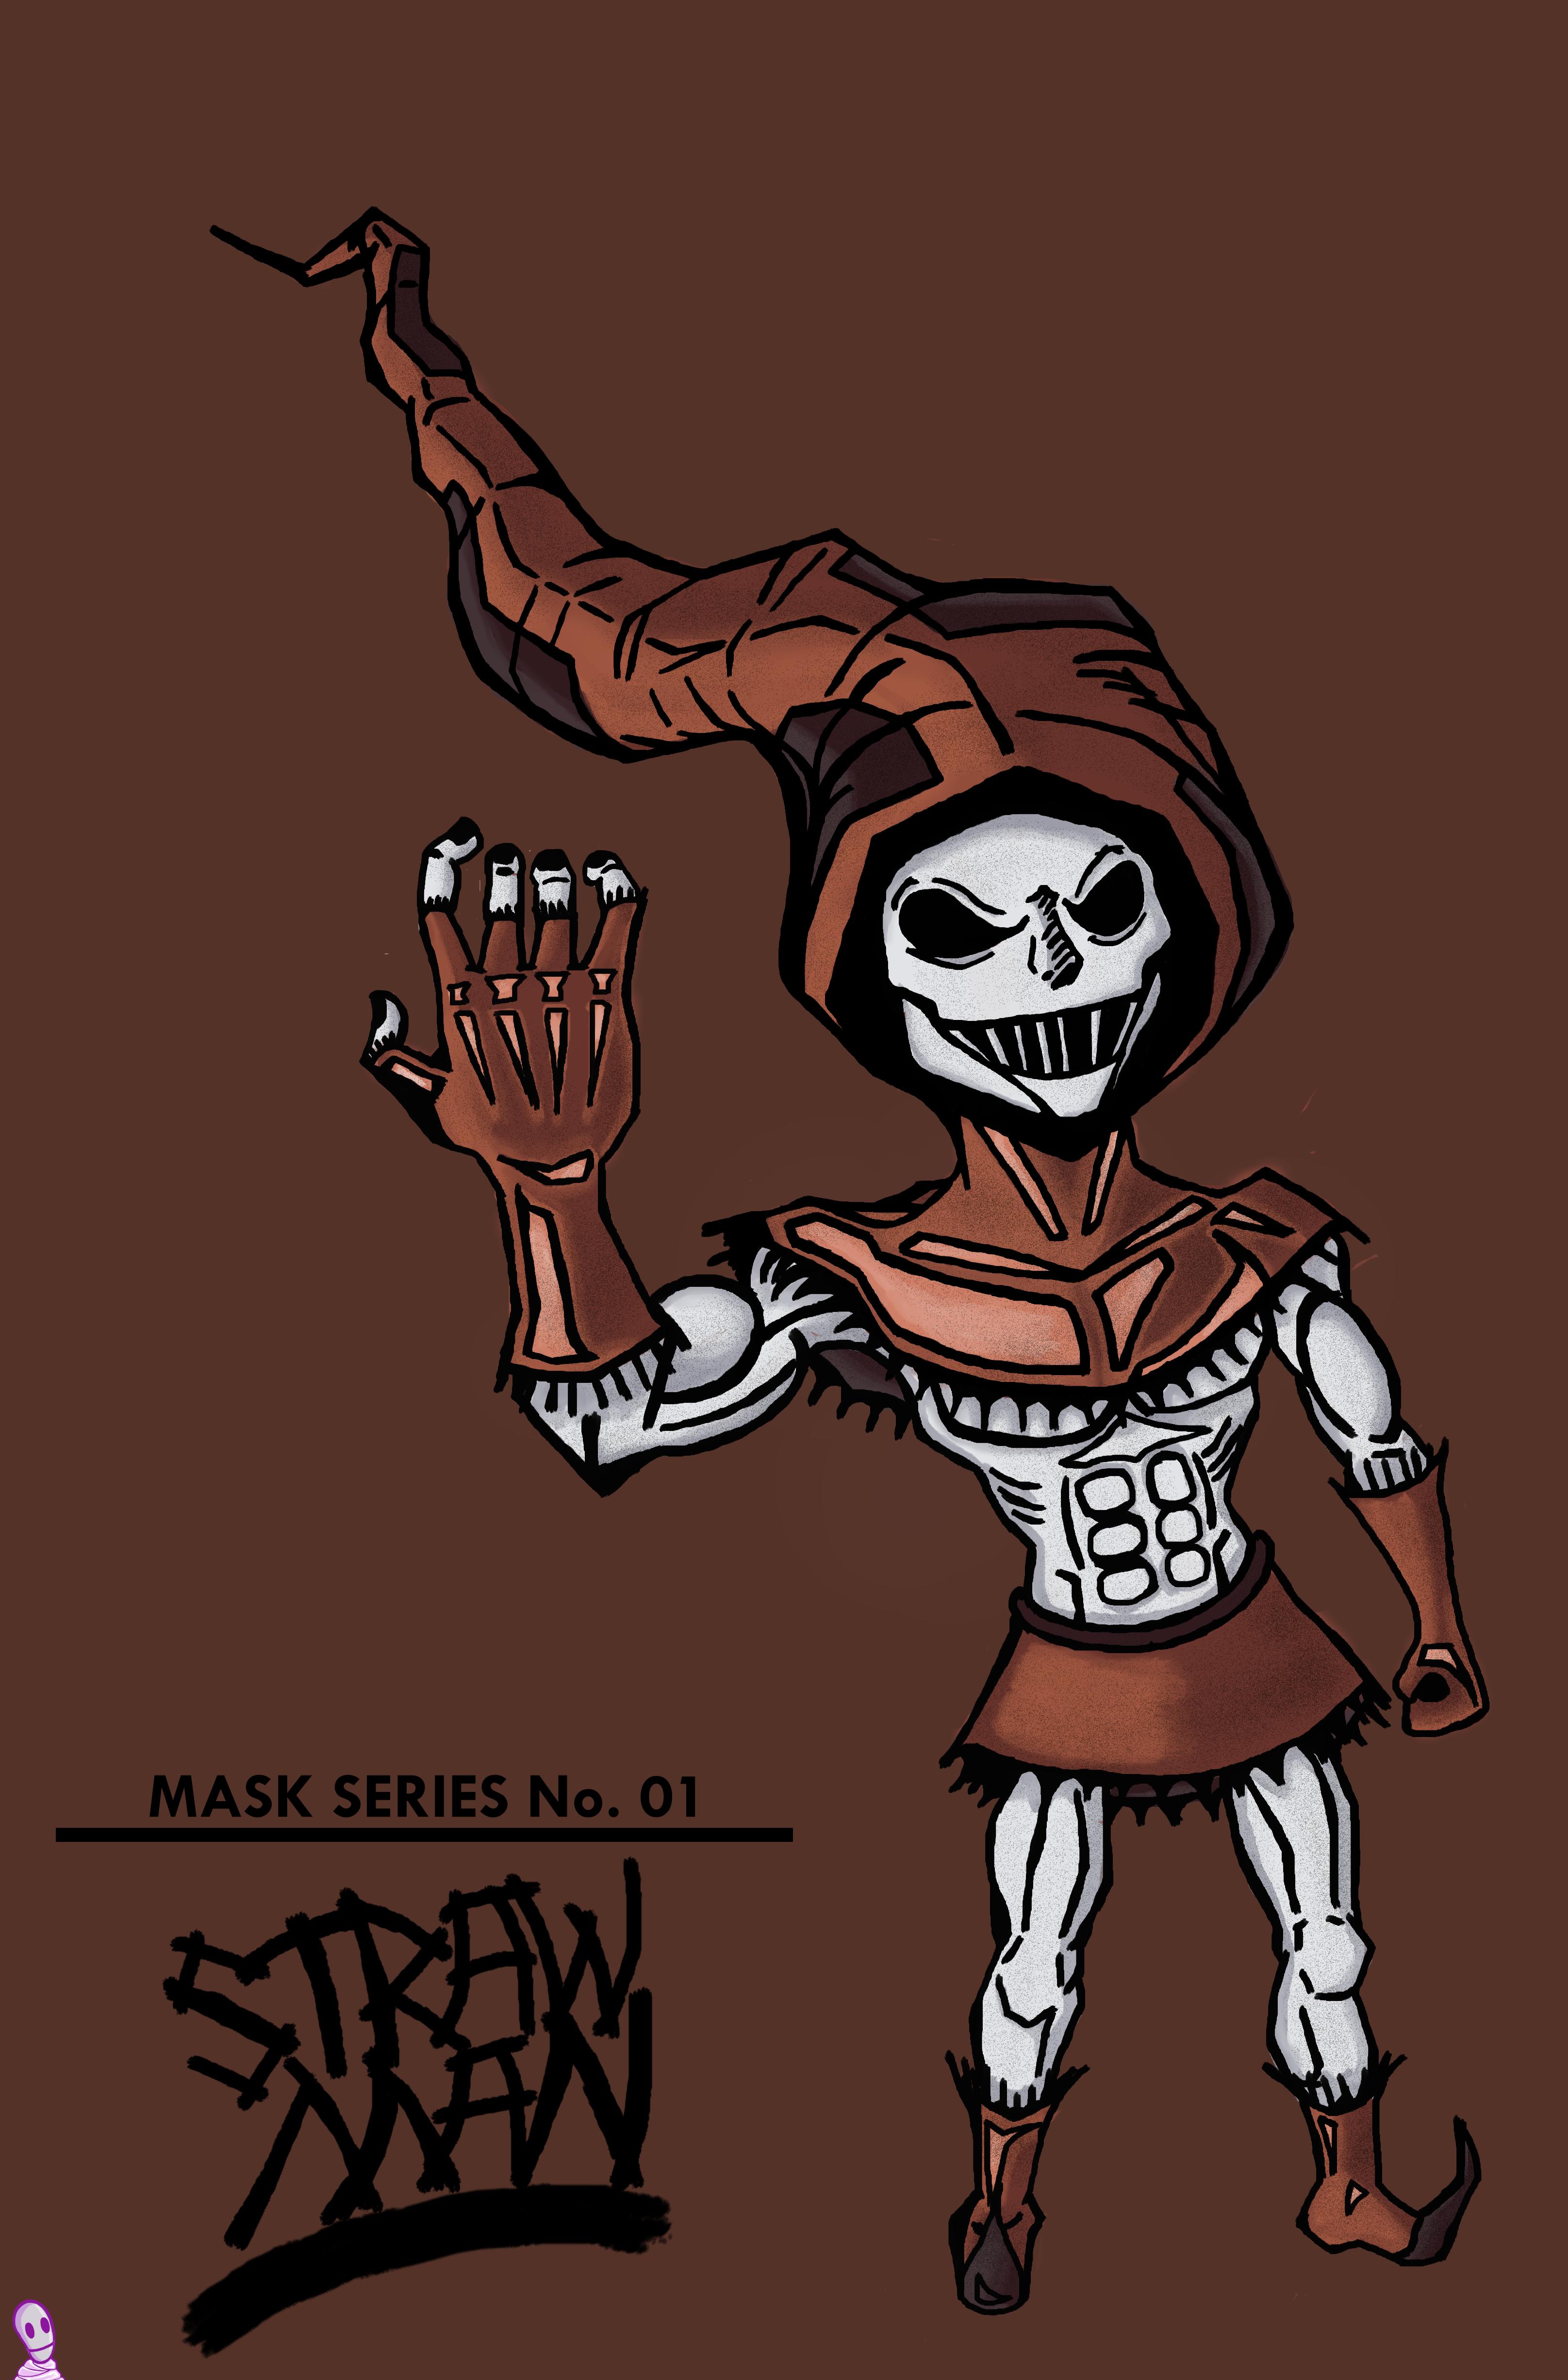 MASK Series No. 1 - Straw Man